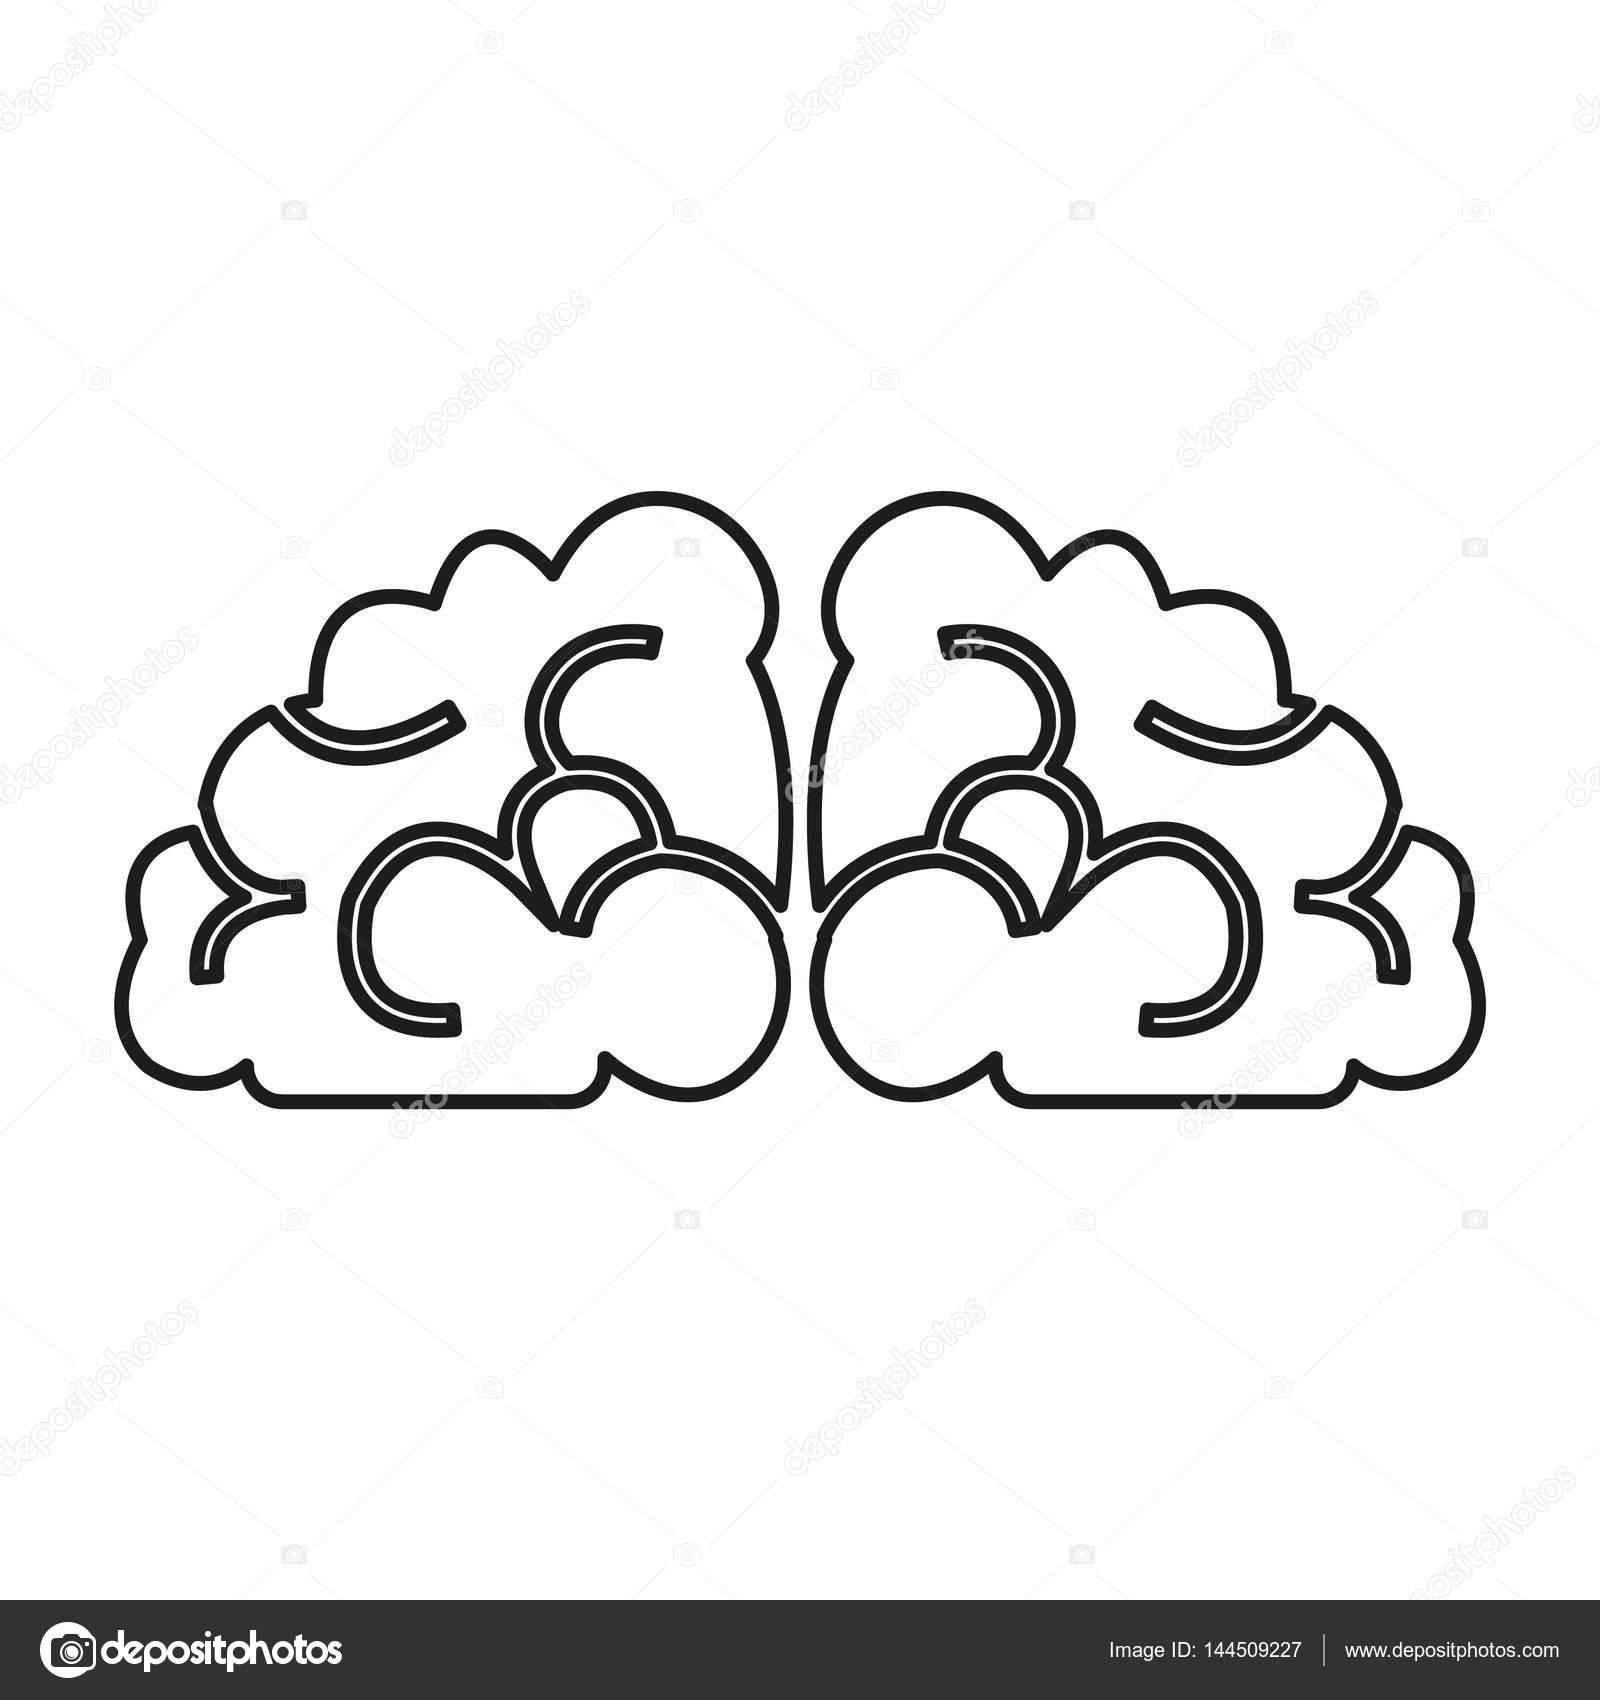 simple brain icon  u2014 stock vector  u00a9 angbay  144509227